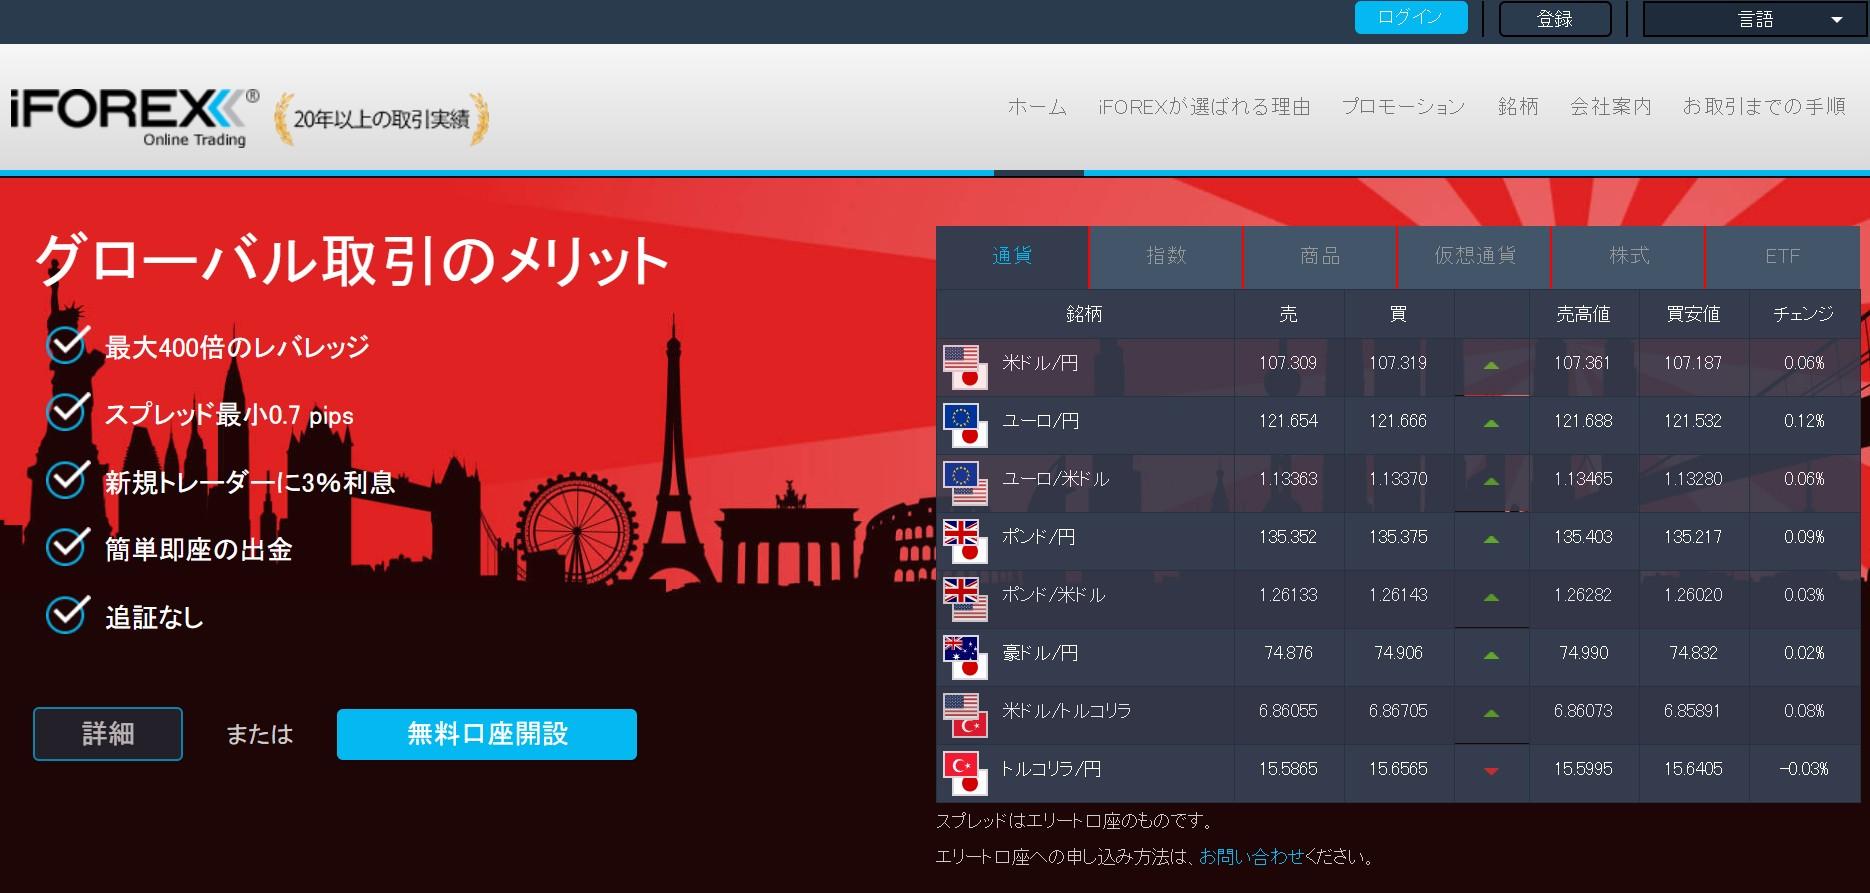 iFOREX公式ウェブサイト